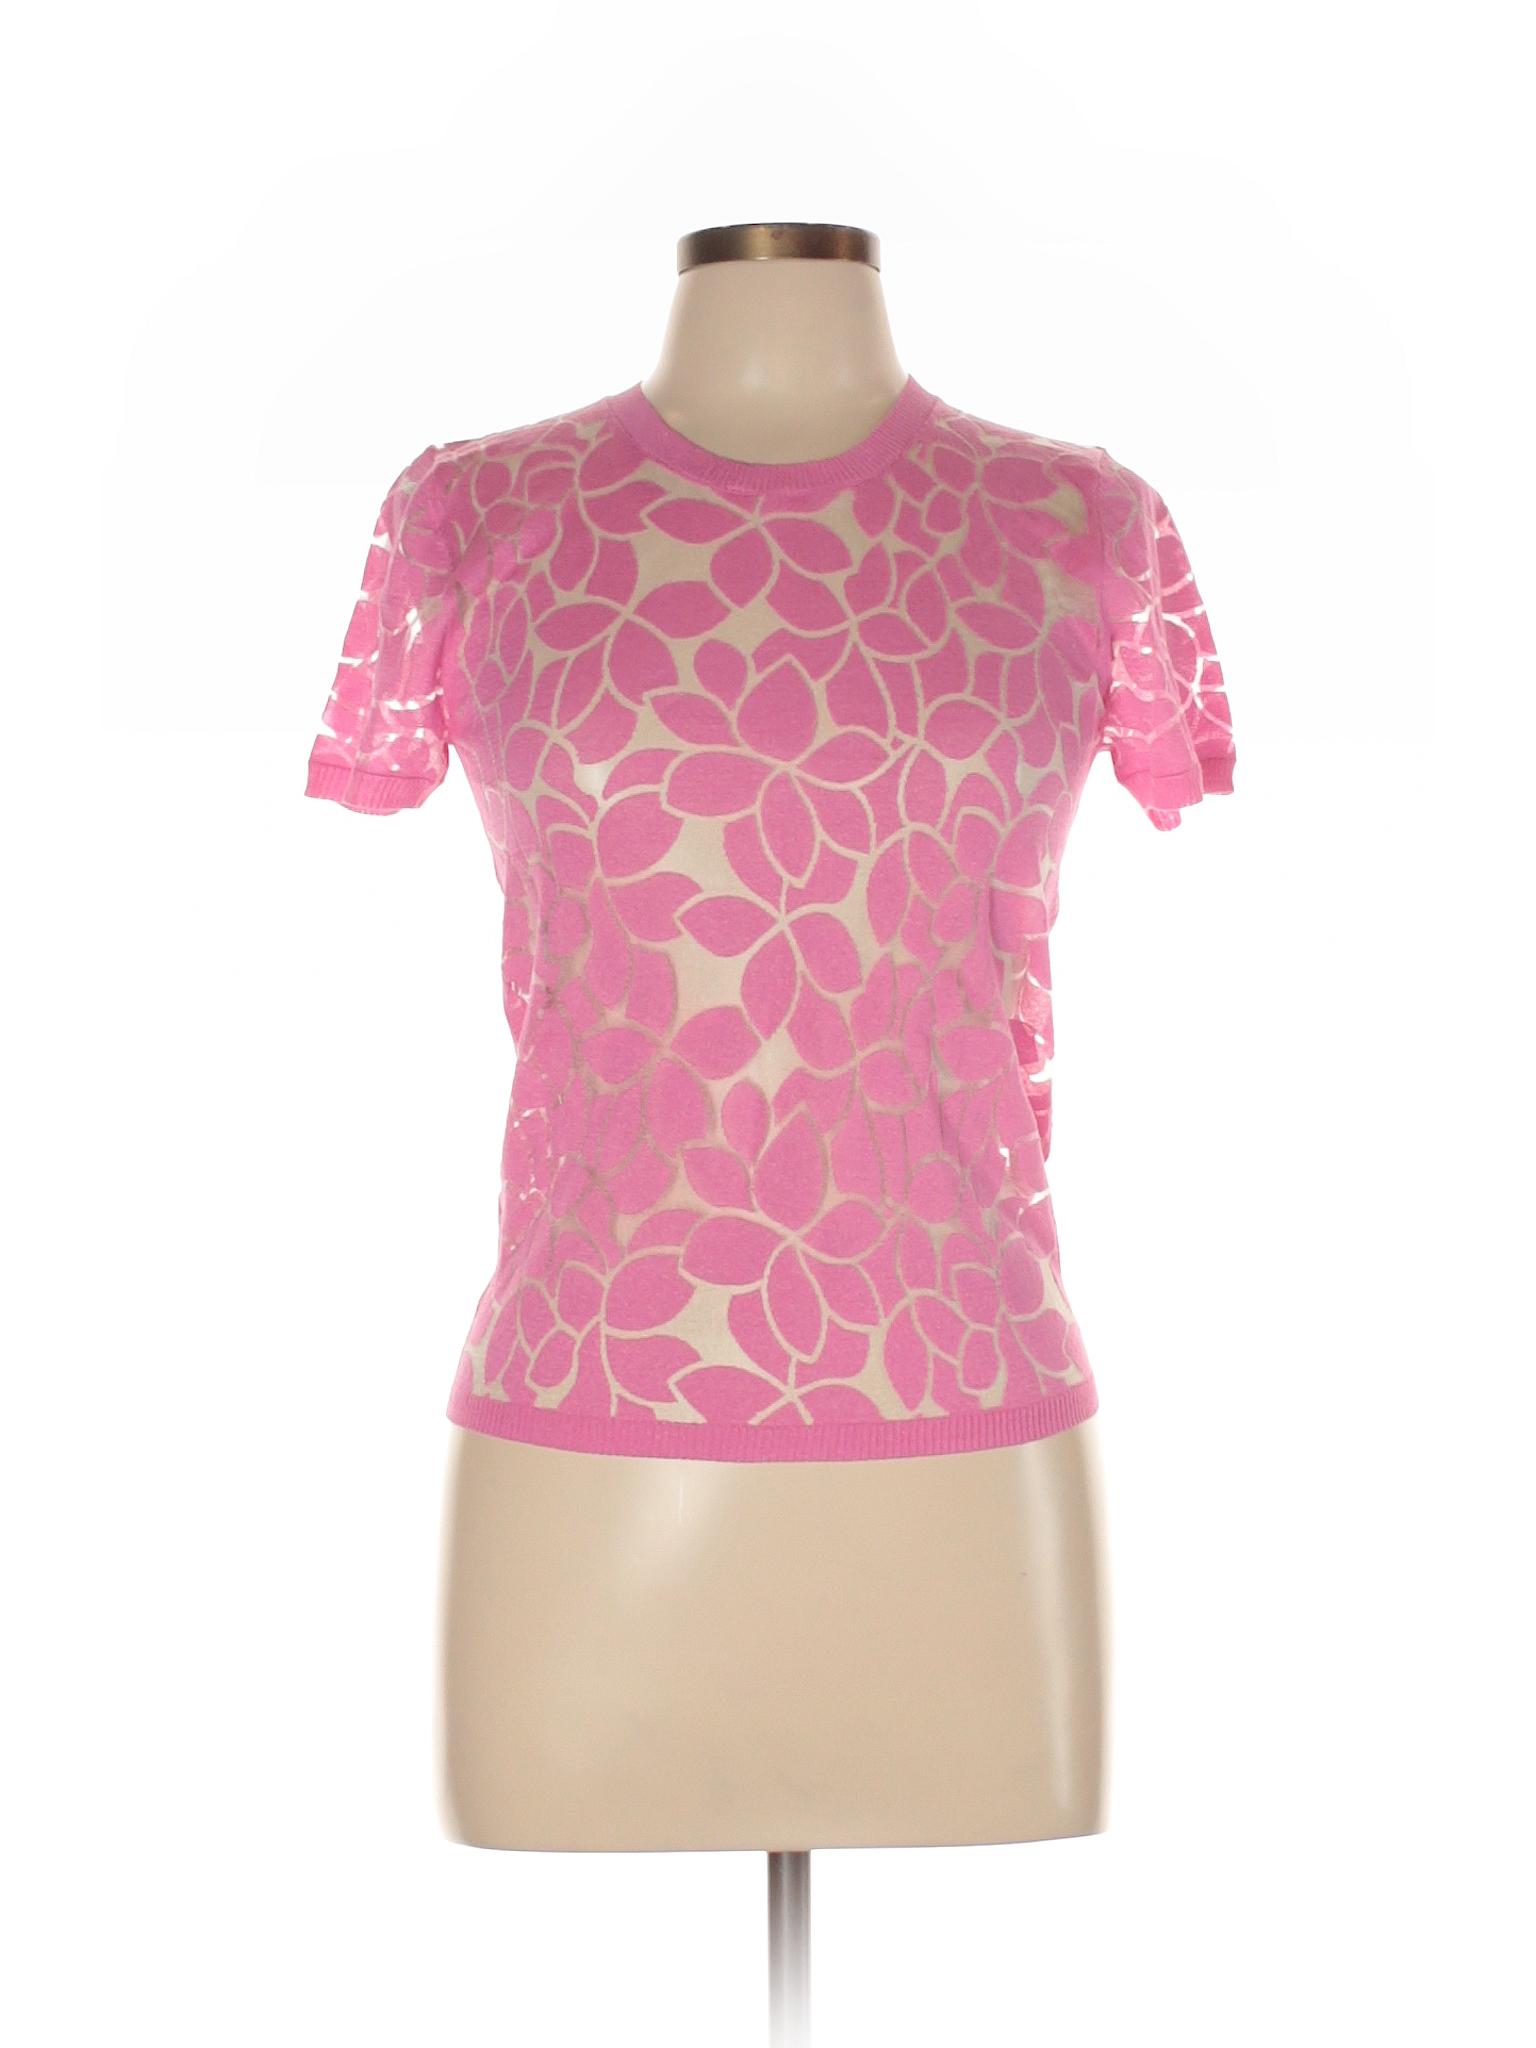 Boutique Baraschi Yoana Pullover Yoana Boutique Sweater SxYqwESrt